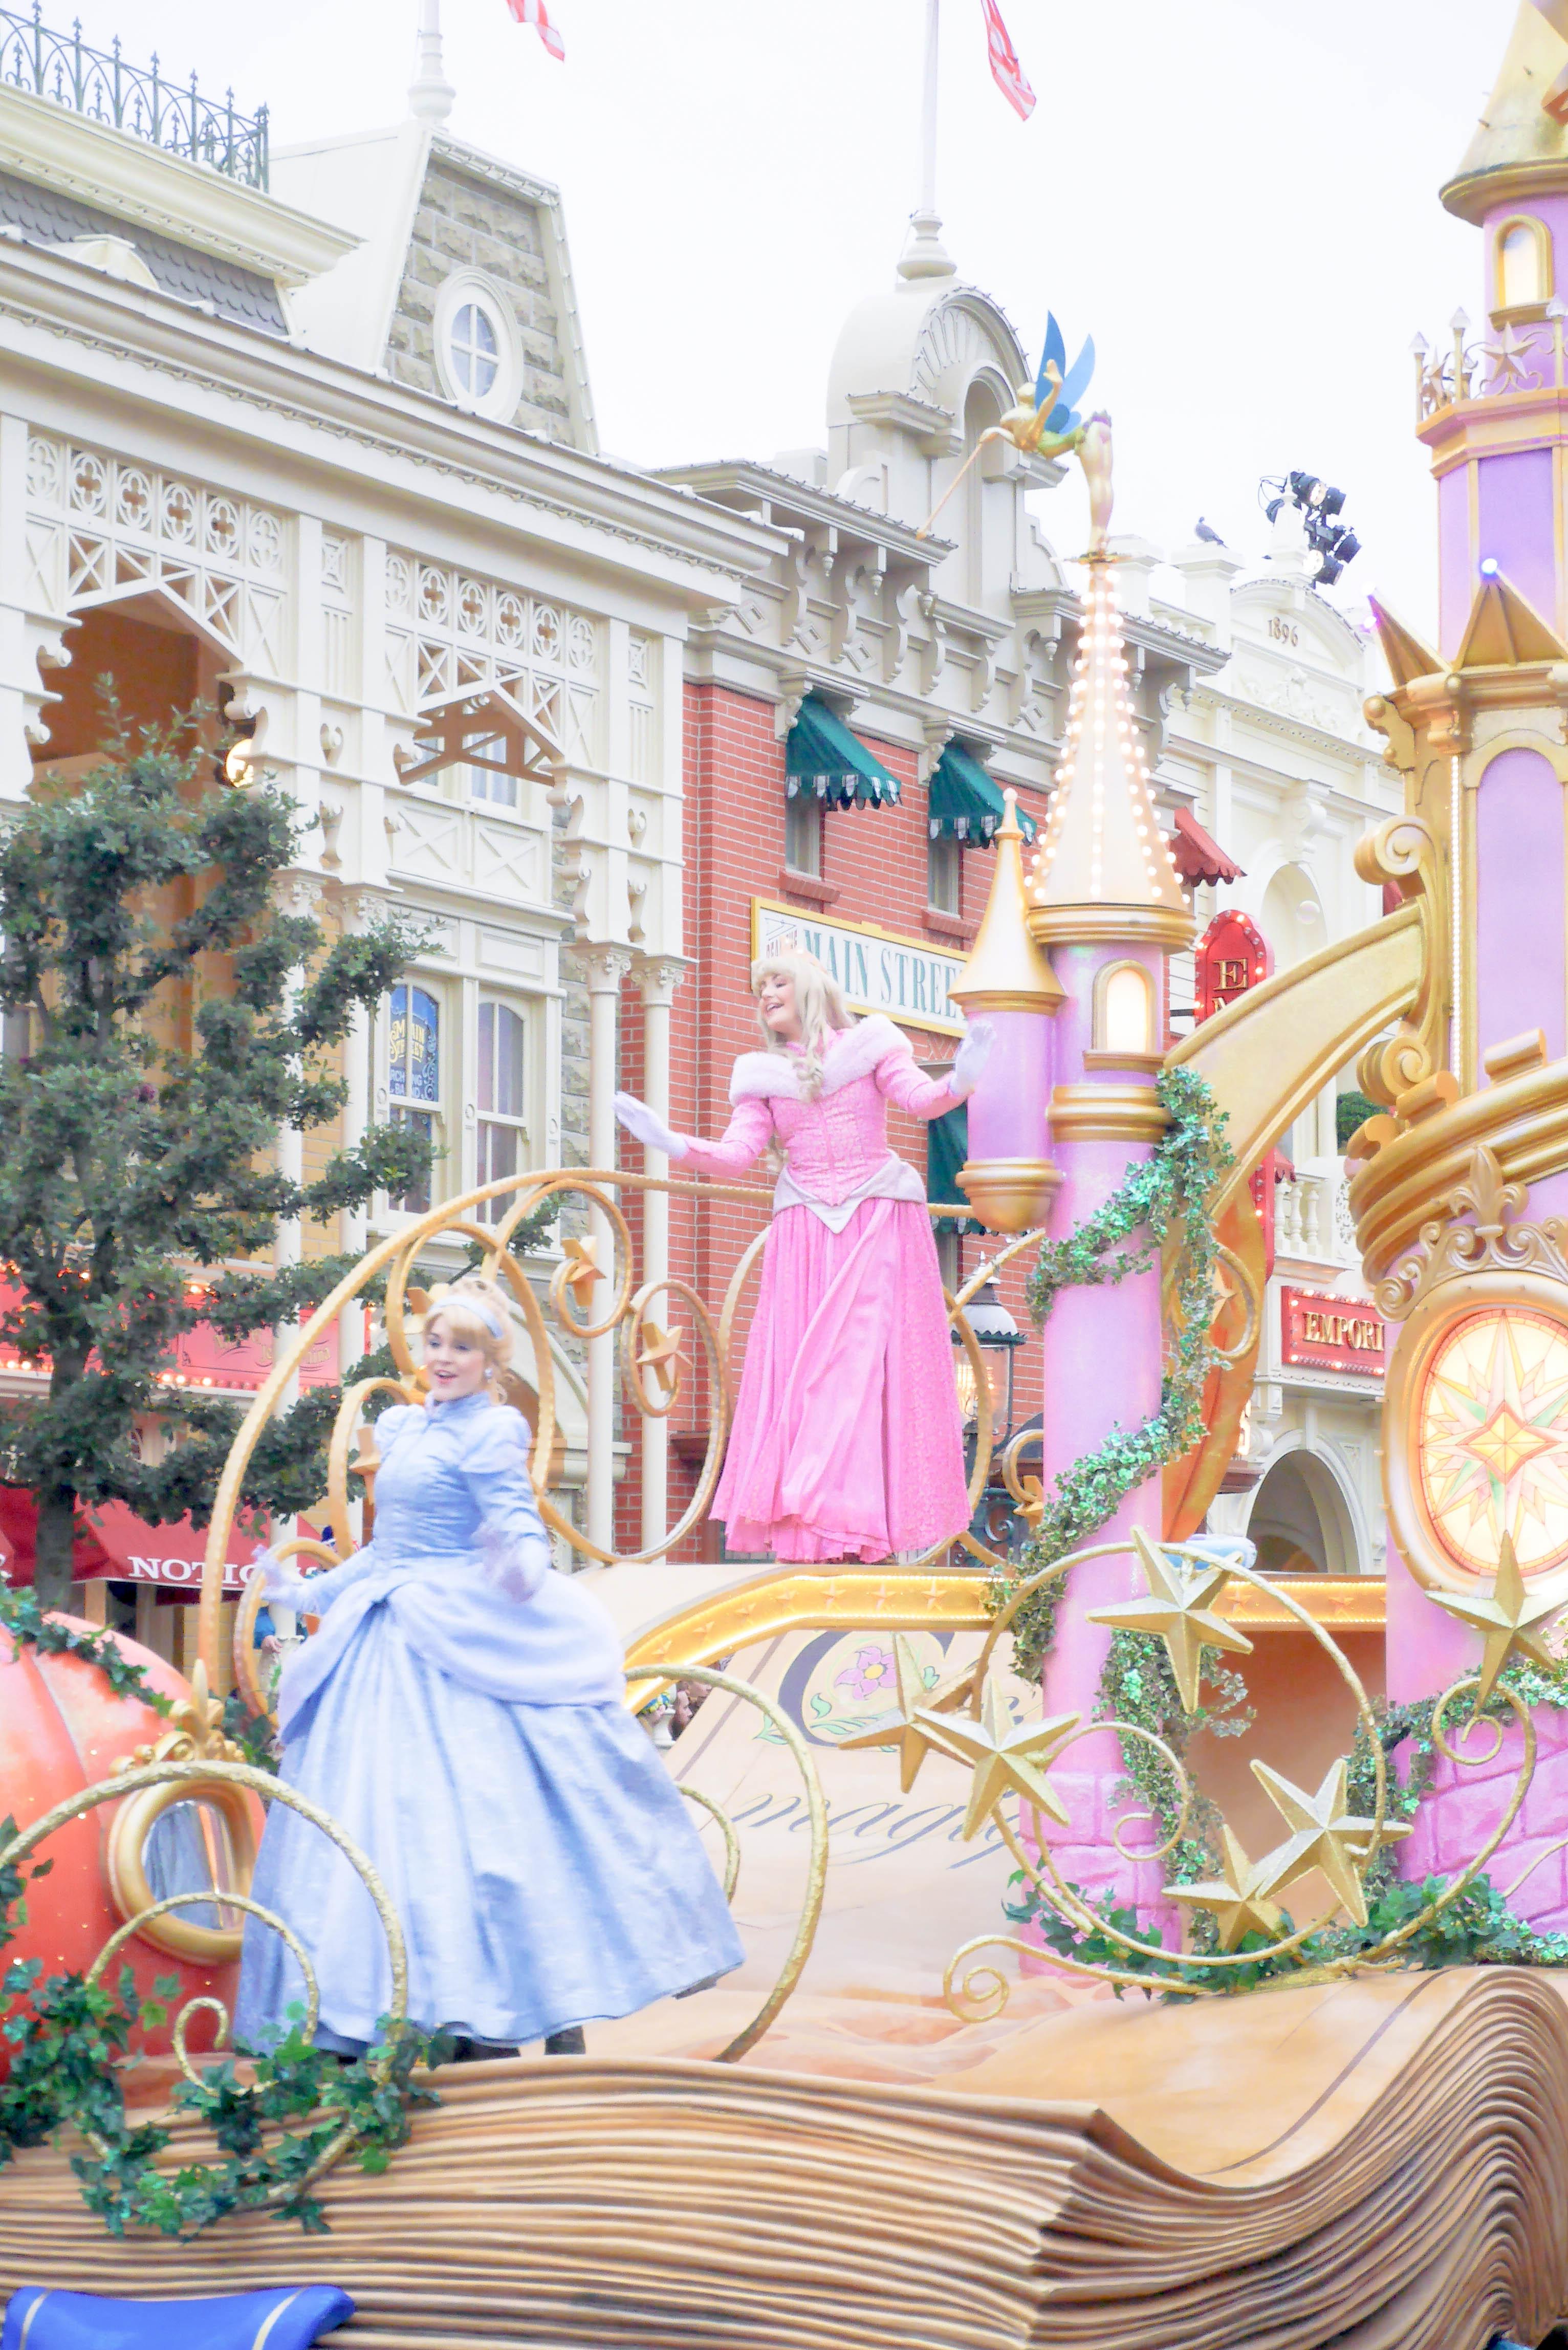 【DLP旅行記】ディズニー・マジック・オン・パレード!(Disney Magic on Parade !)【イギリス・ロンドン旅行31】